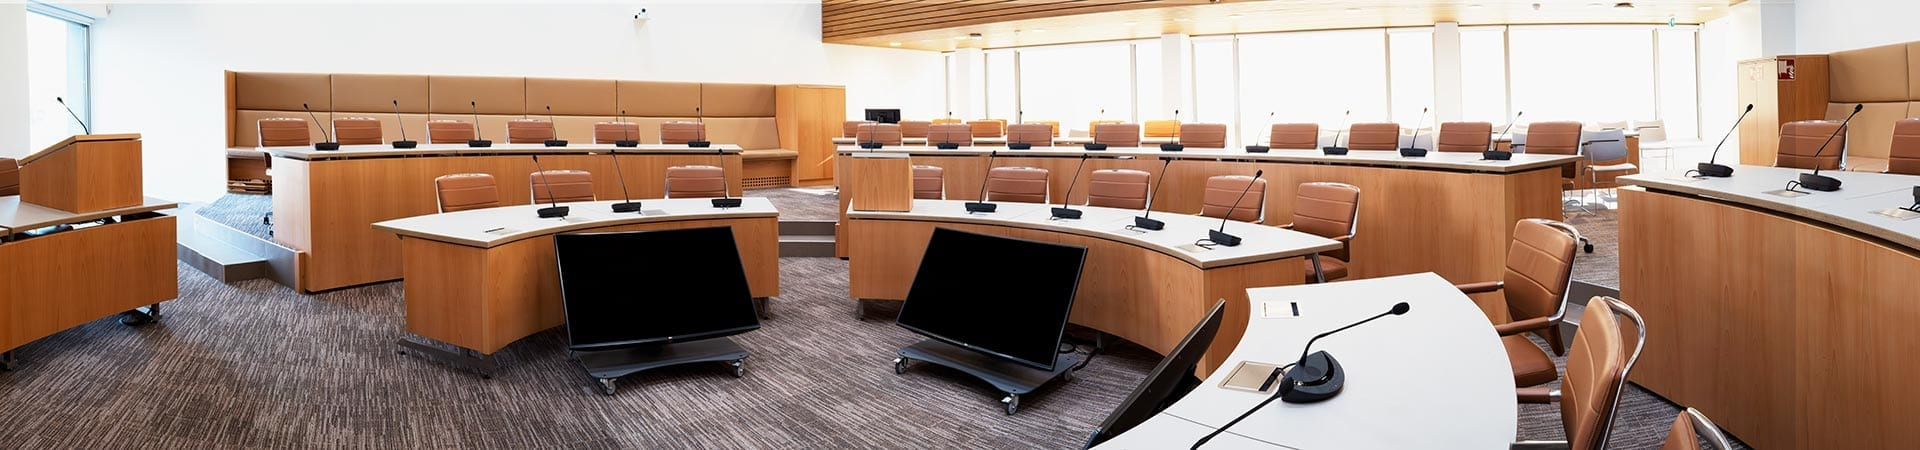 Council Chamber - Heuvelman